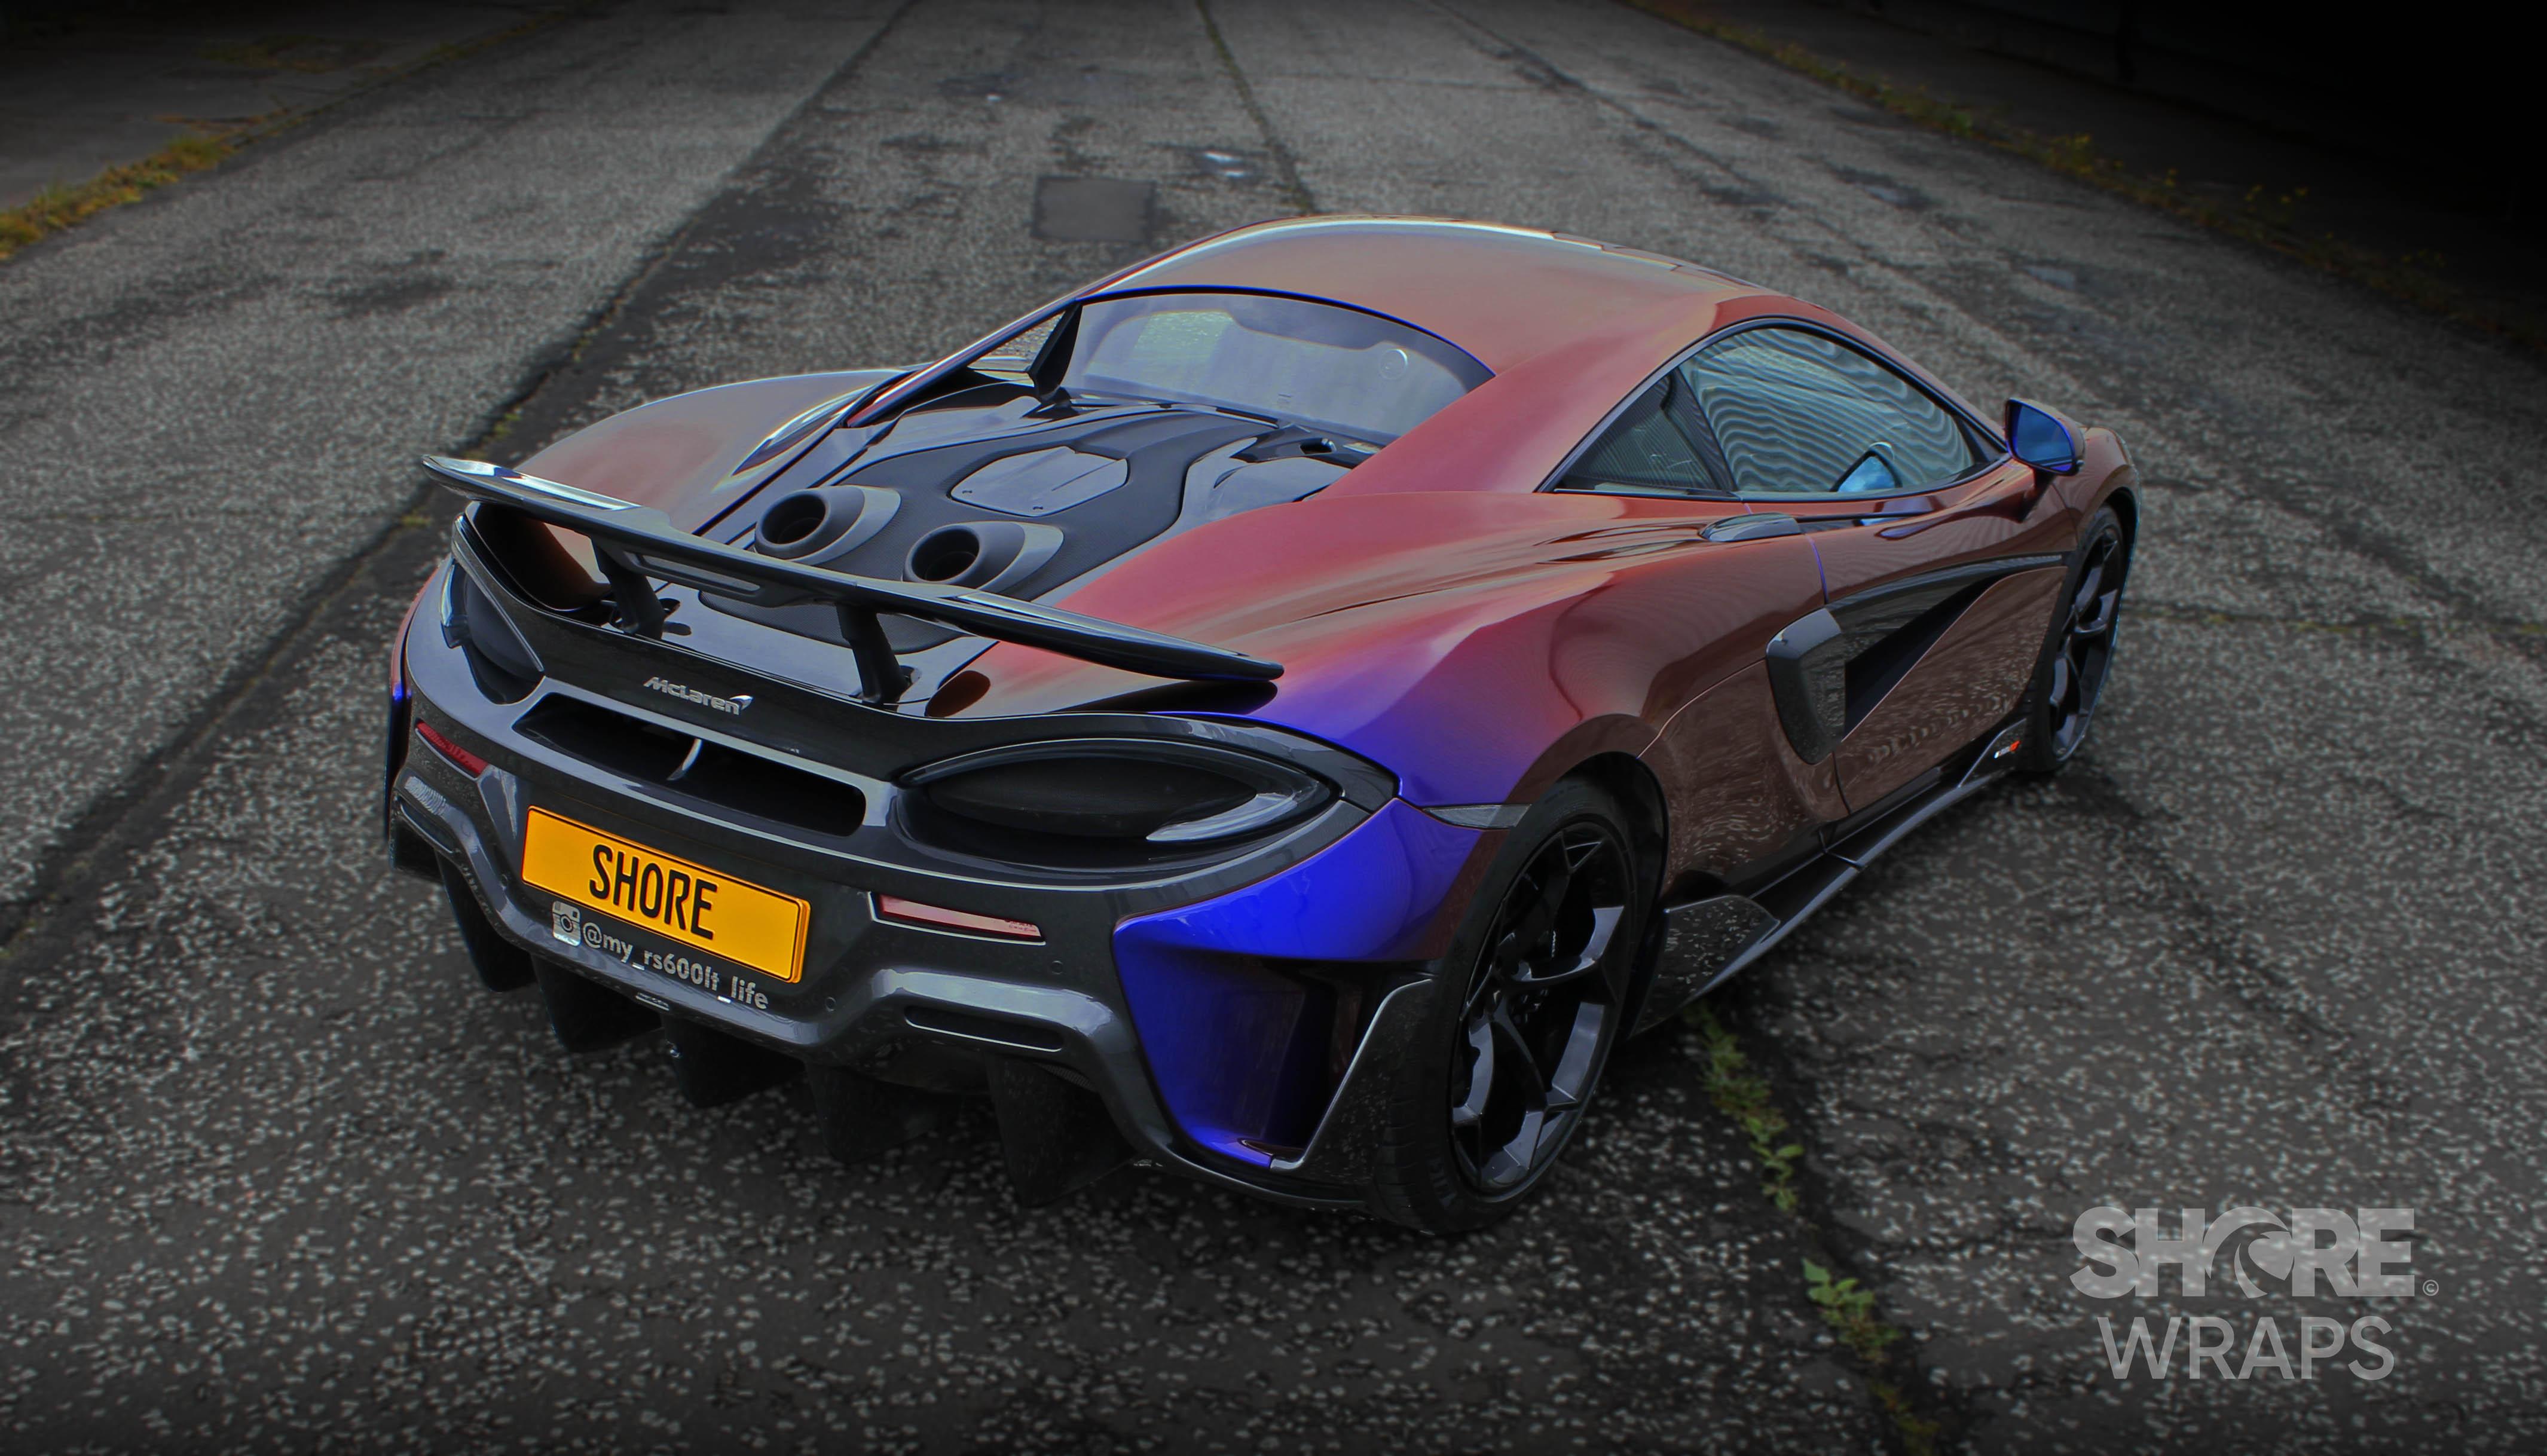 McLaren 600 Lt Wrap